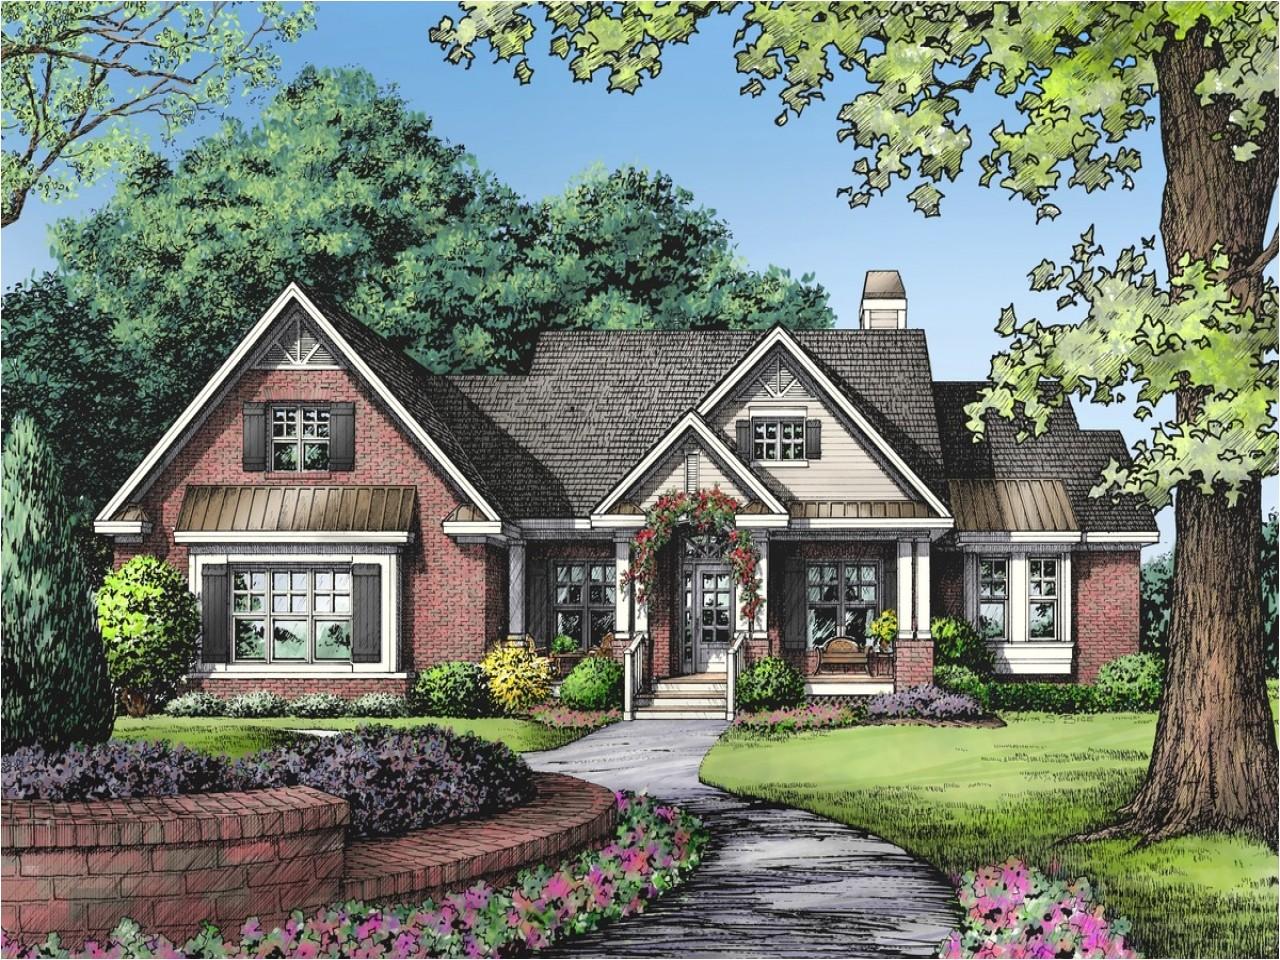 Masonry Home Plans One Story Brick Ranch House Plans One Story Ranch Modular